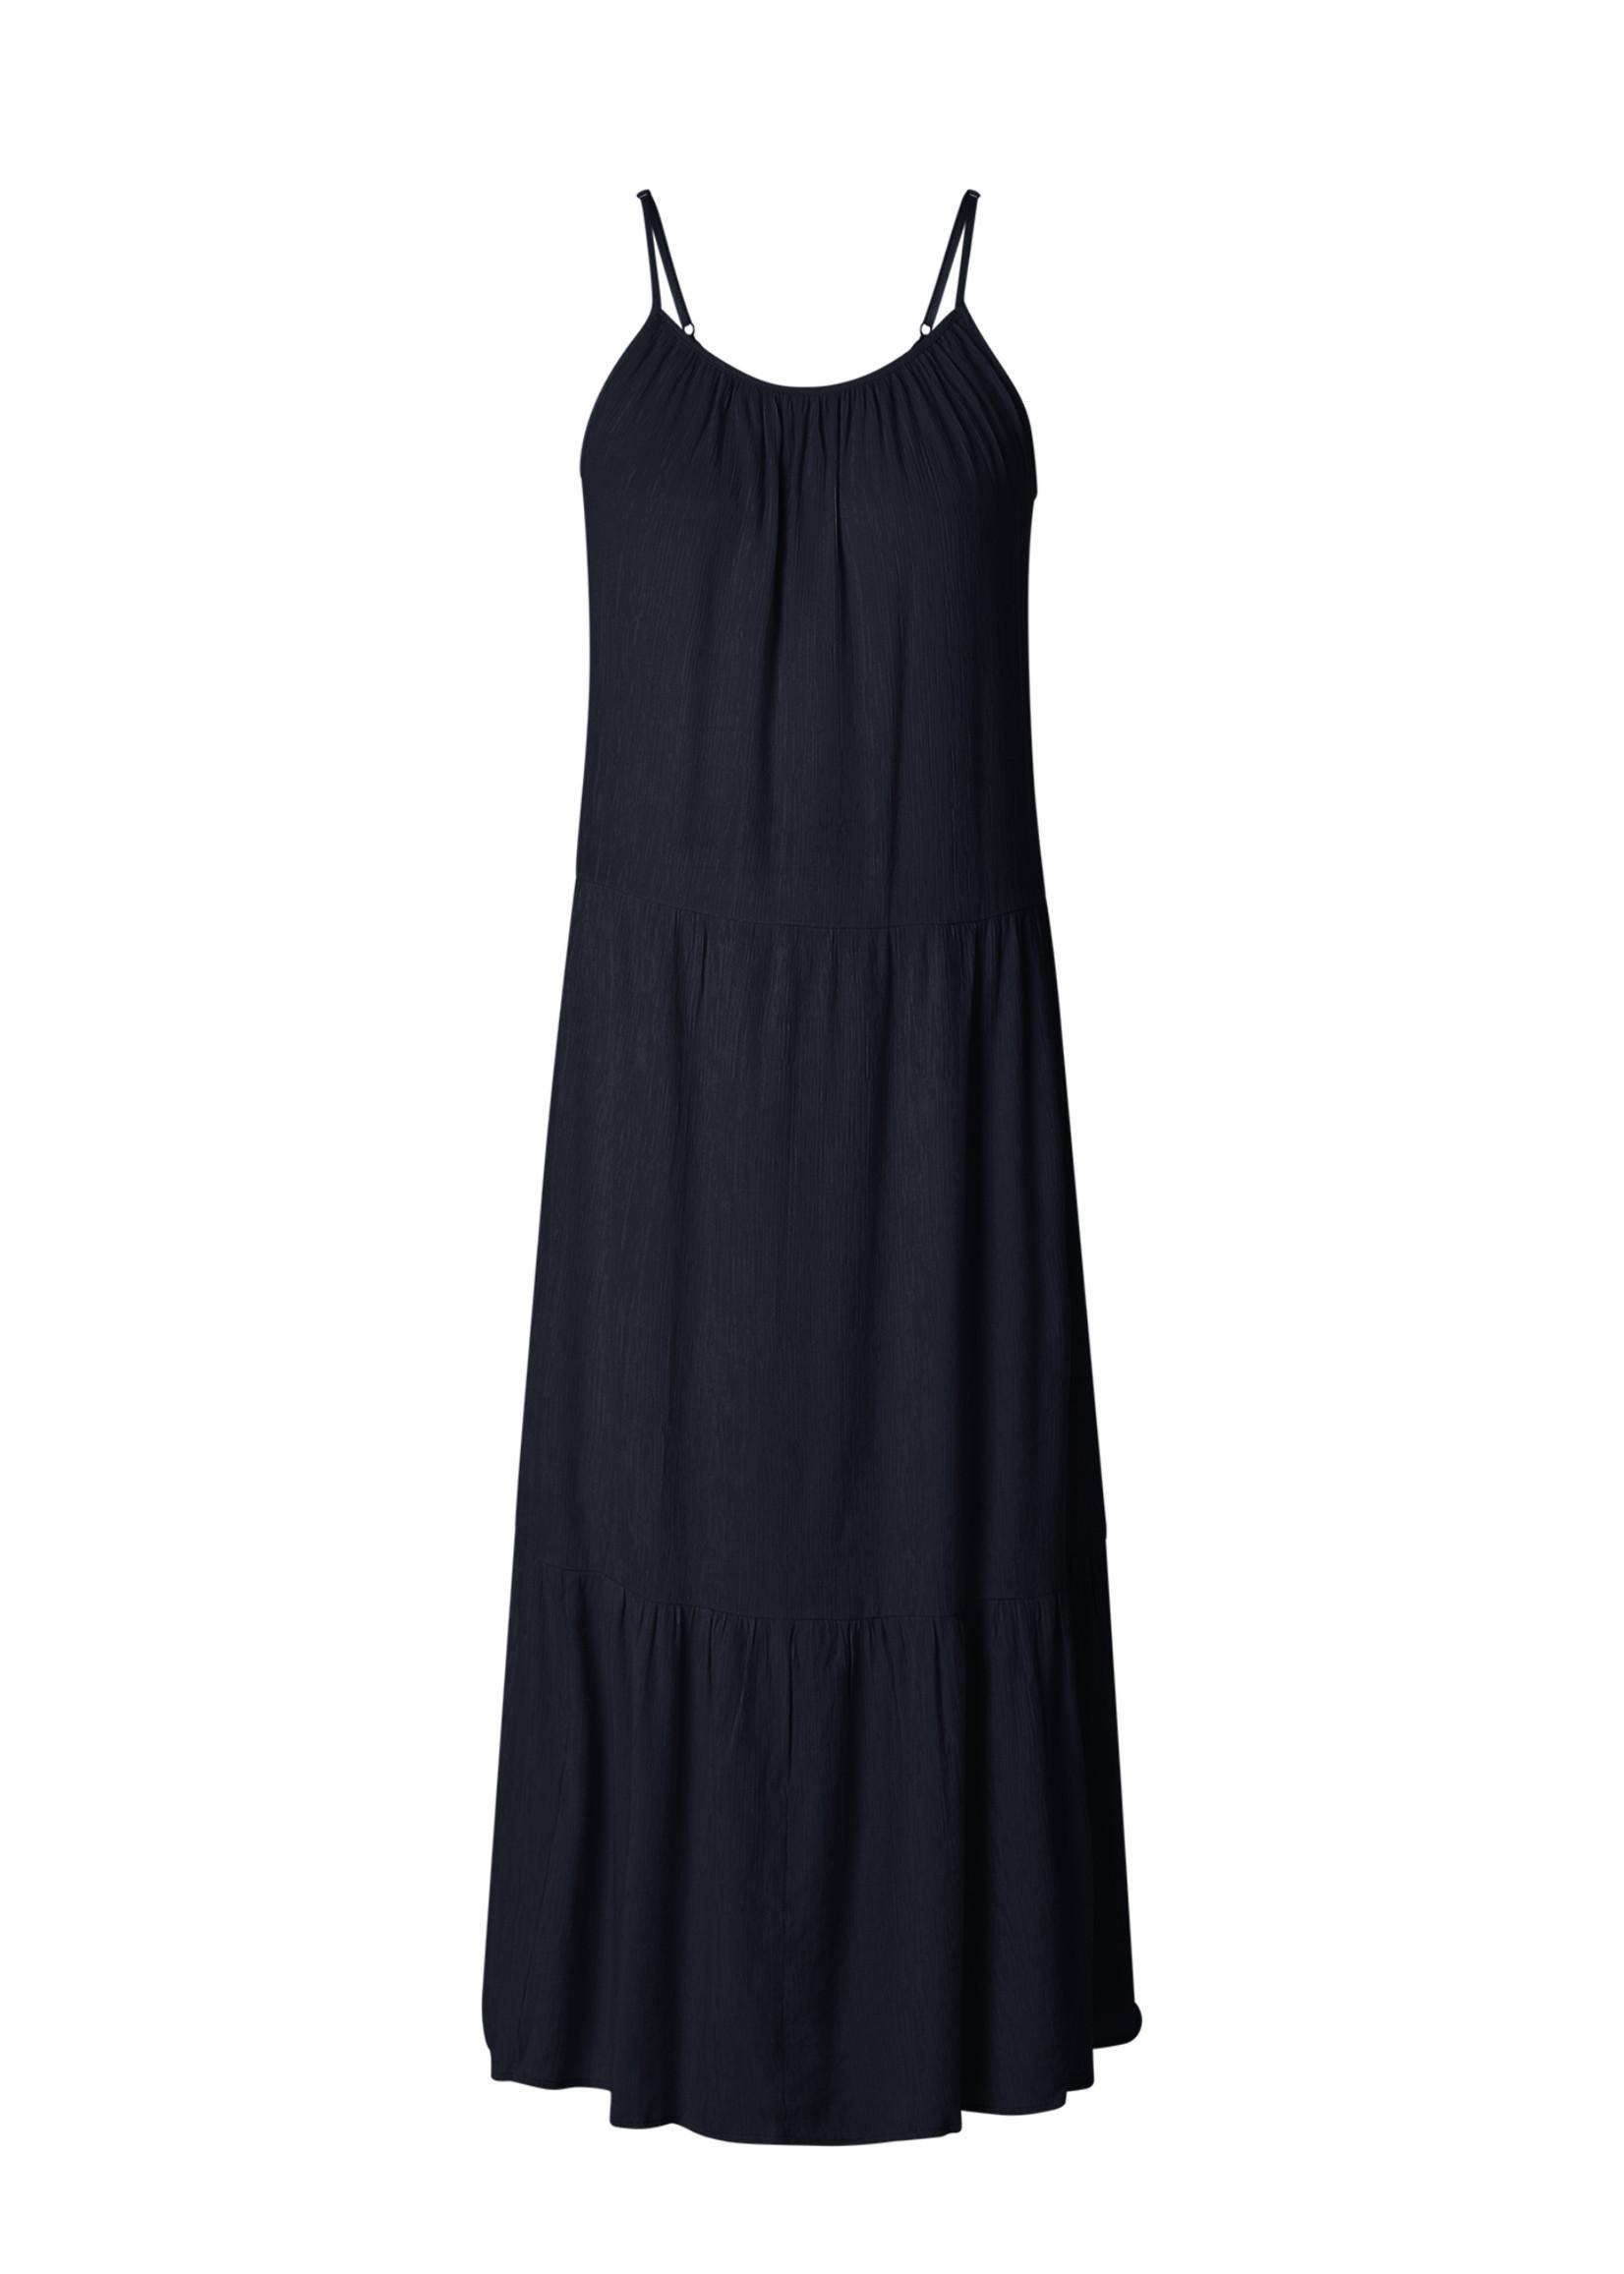 Yesta Yesta Lincy Dress